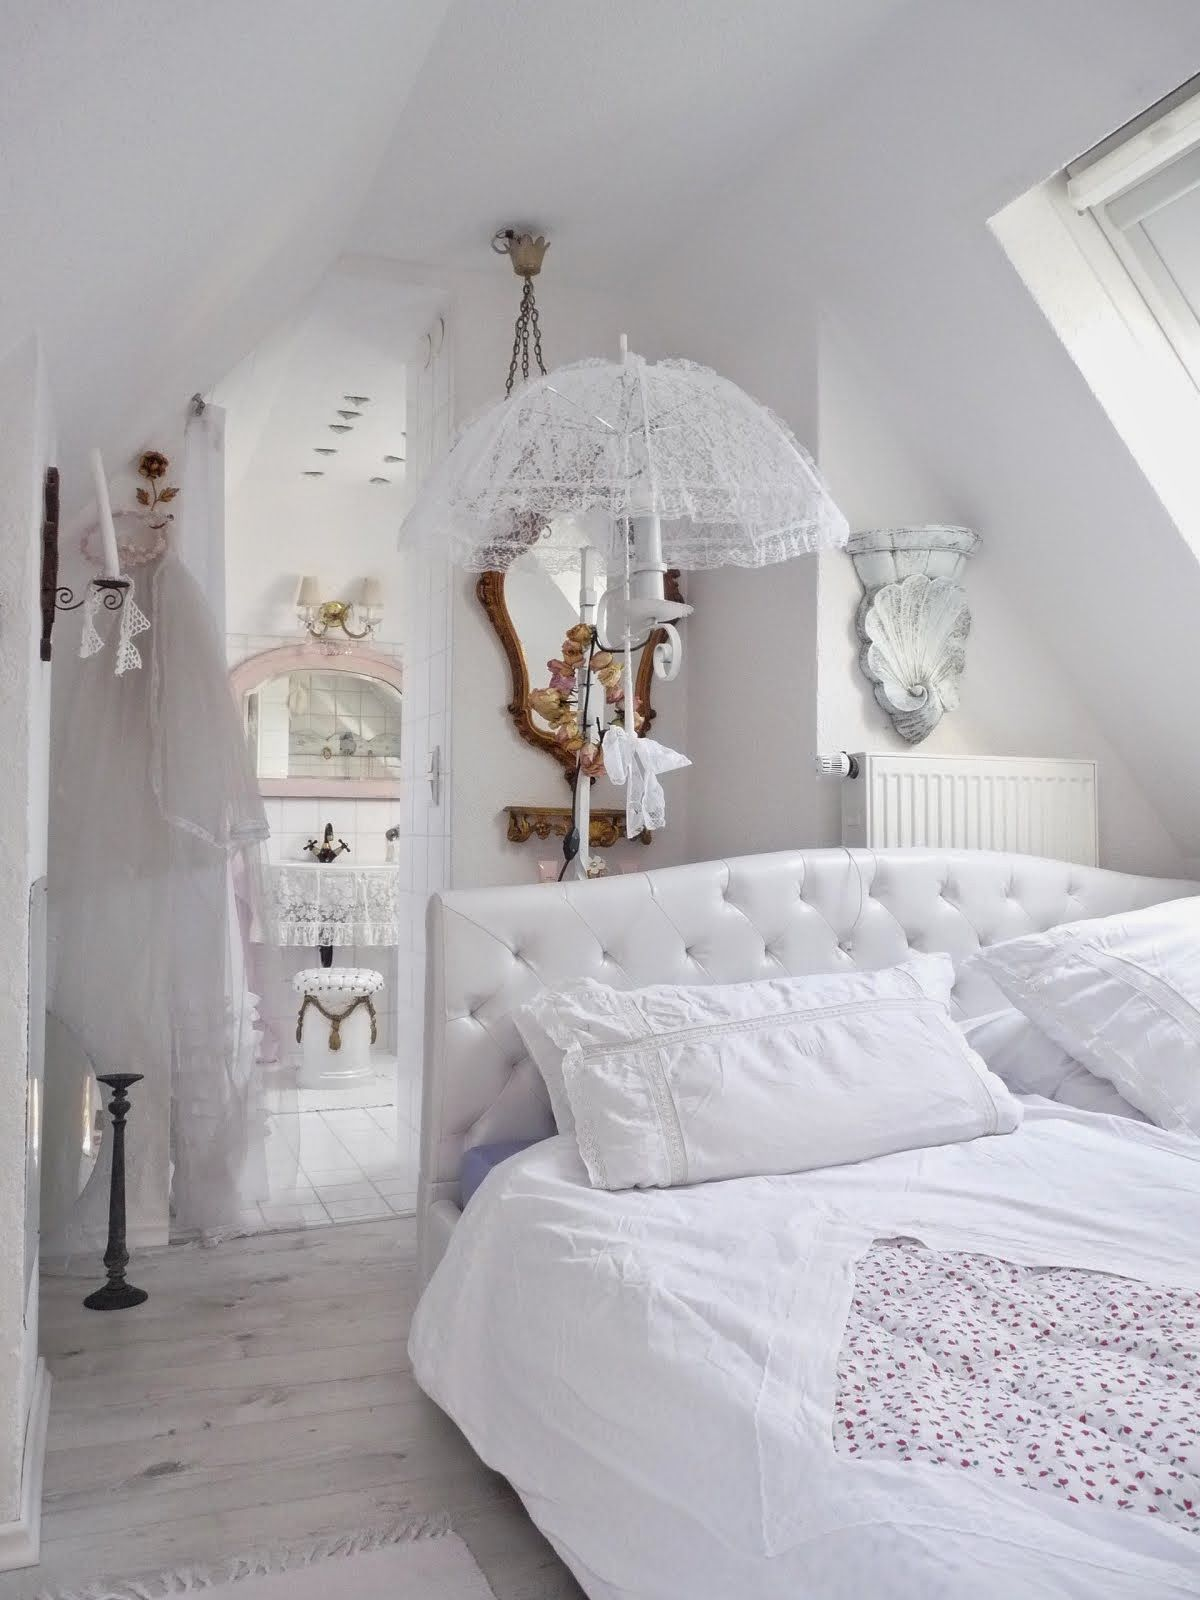 Schlafzimmer Shabby Chic Design Pinterest Shabby Chic Bedrooms